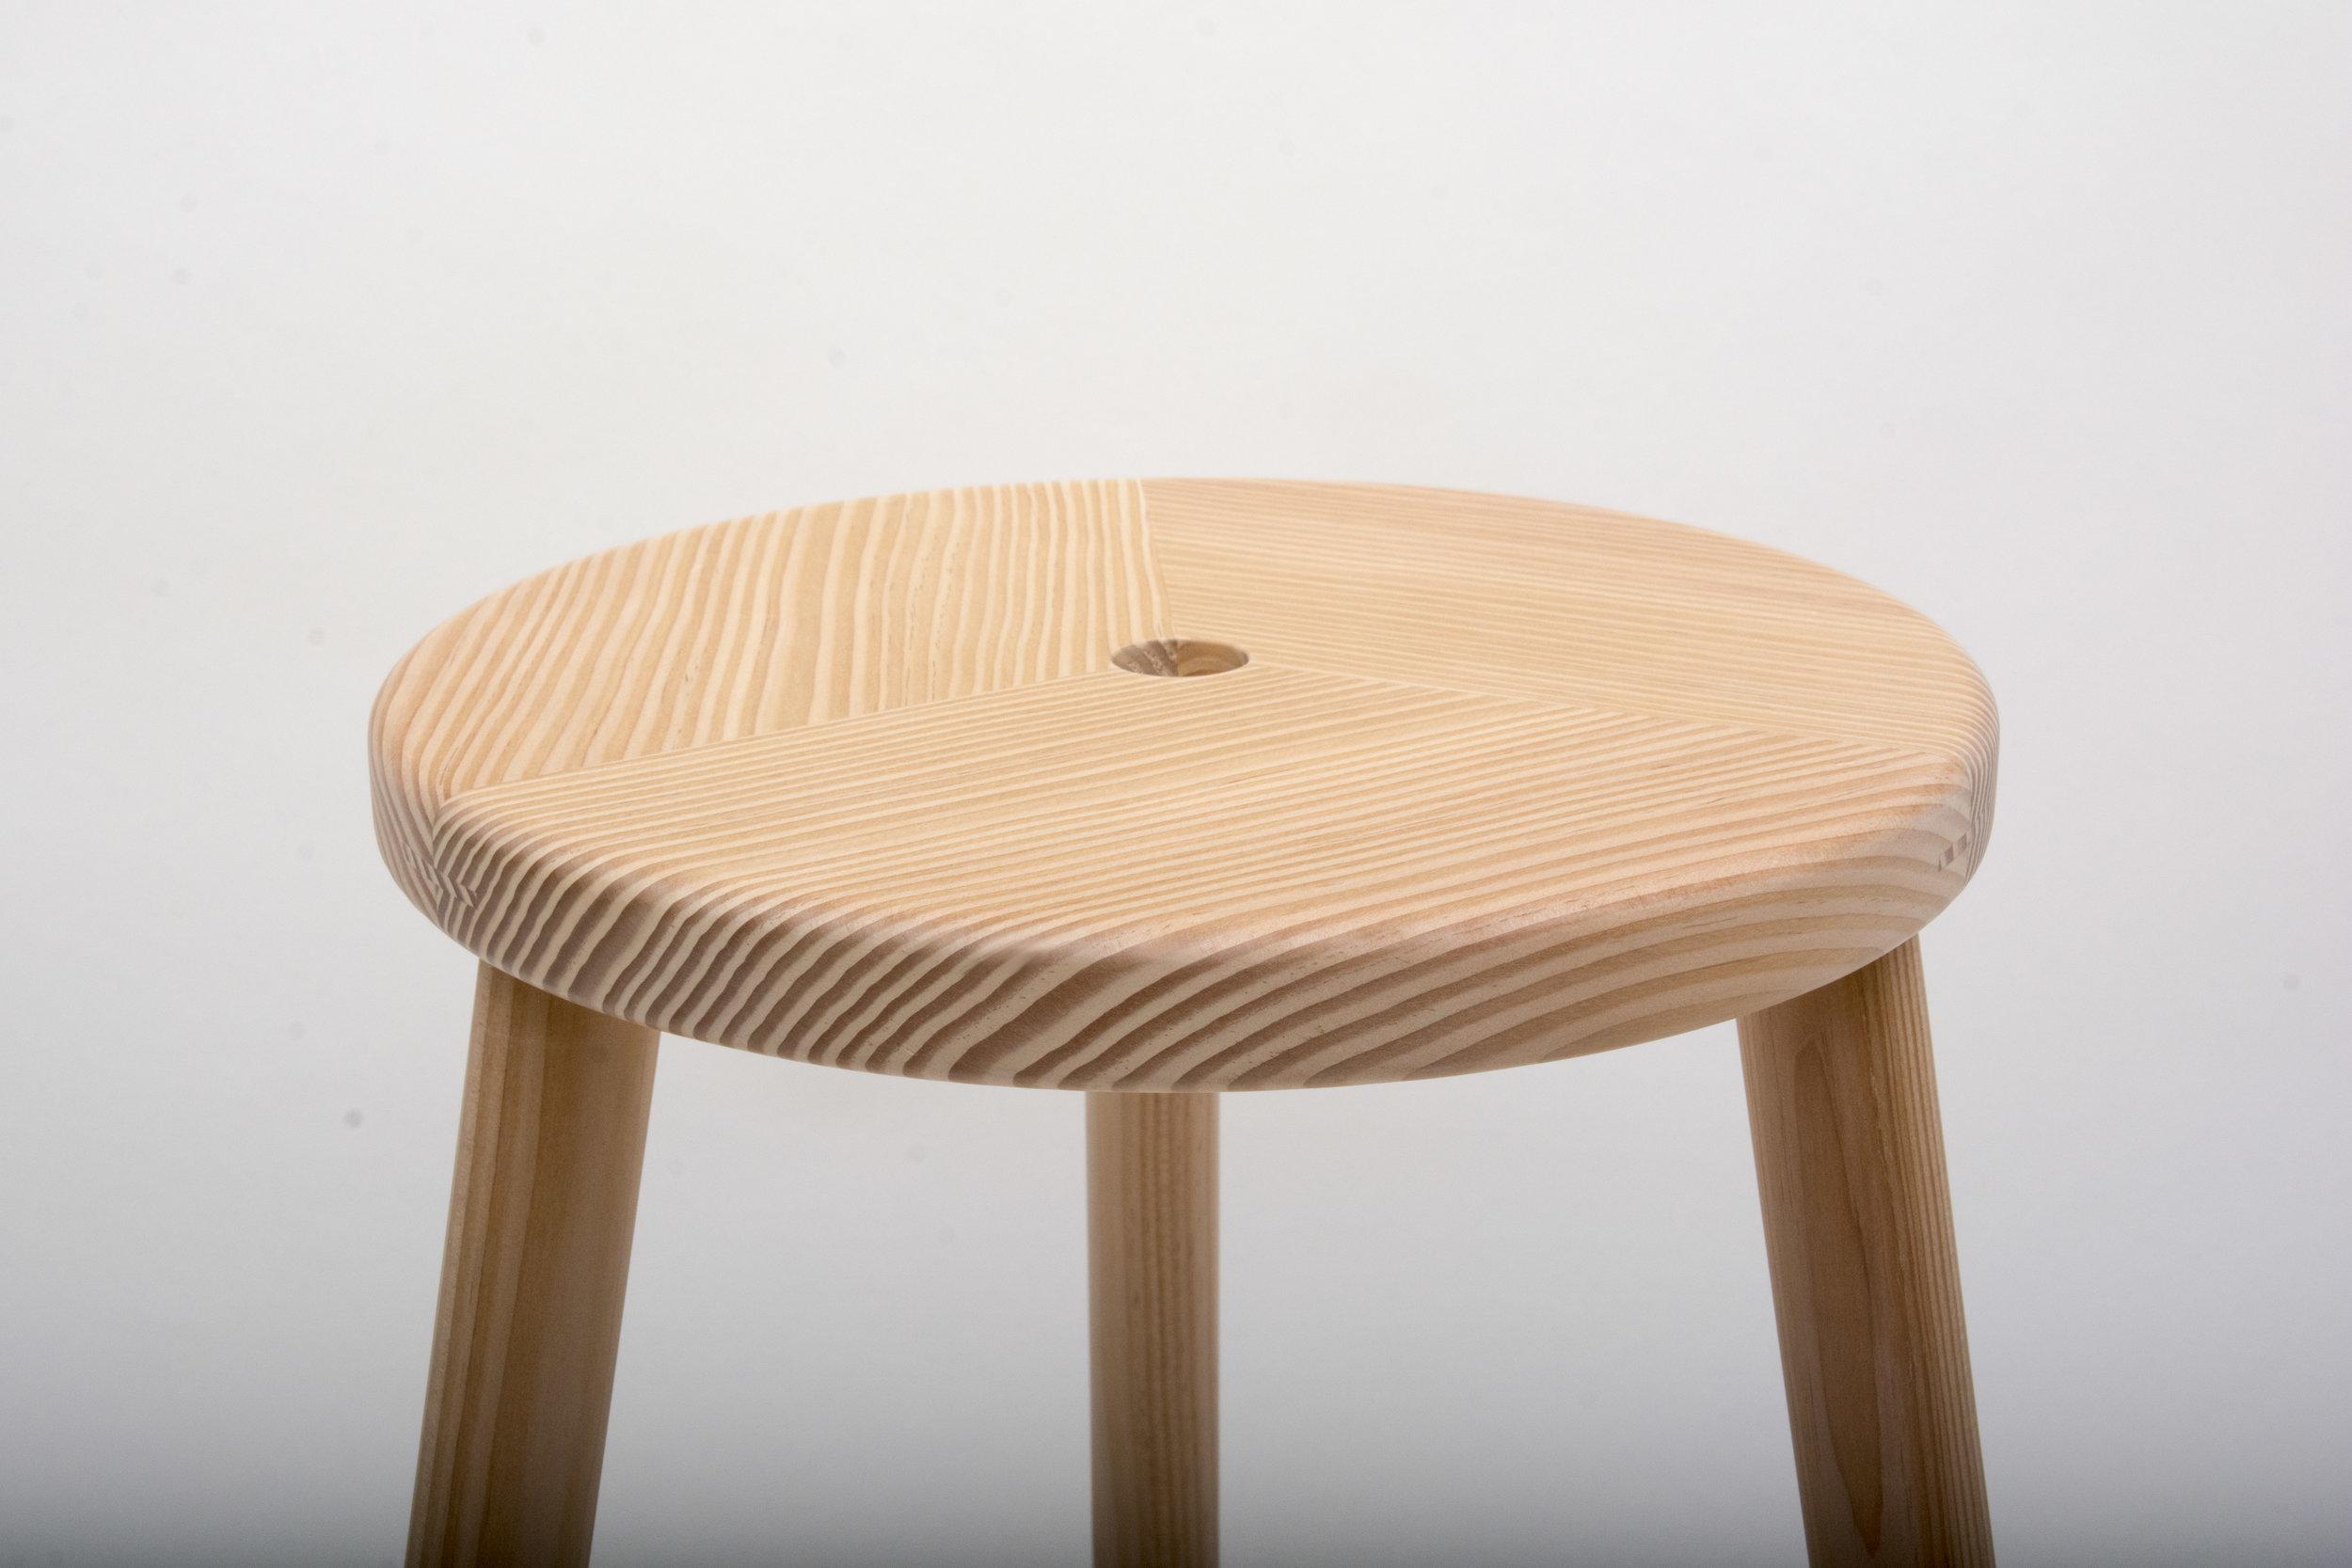 lamp stool bc edition 4.jpg